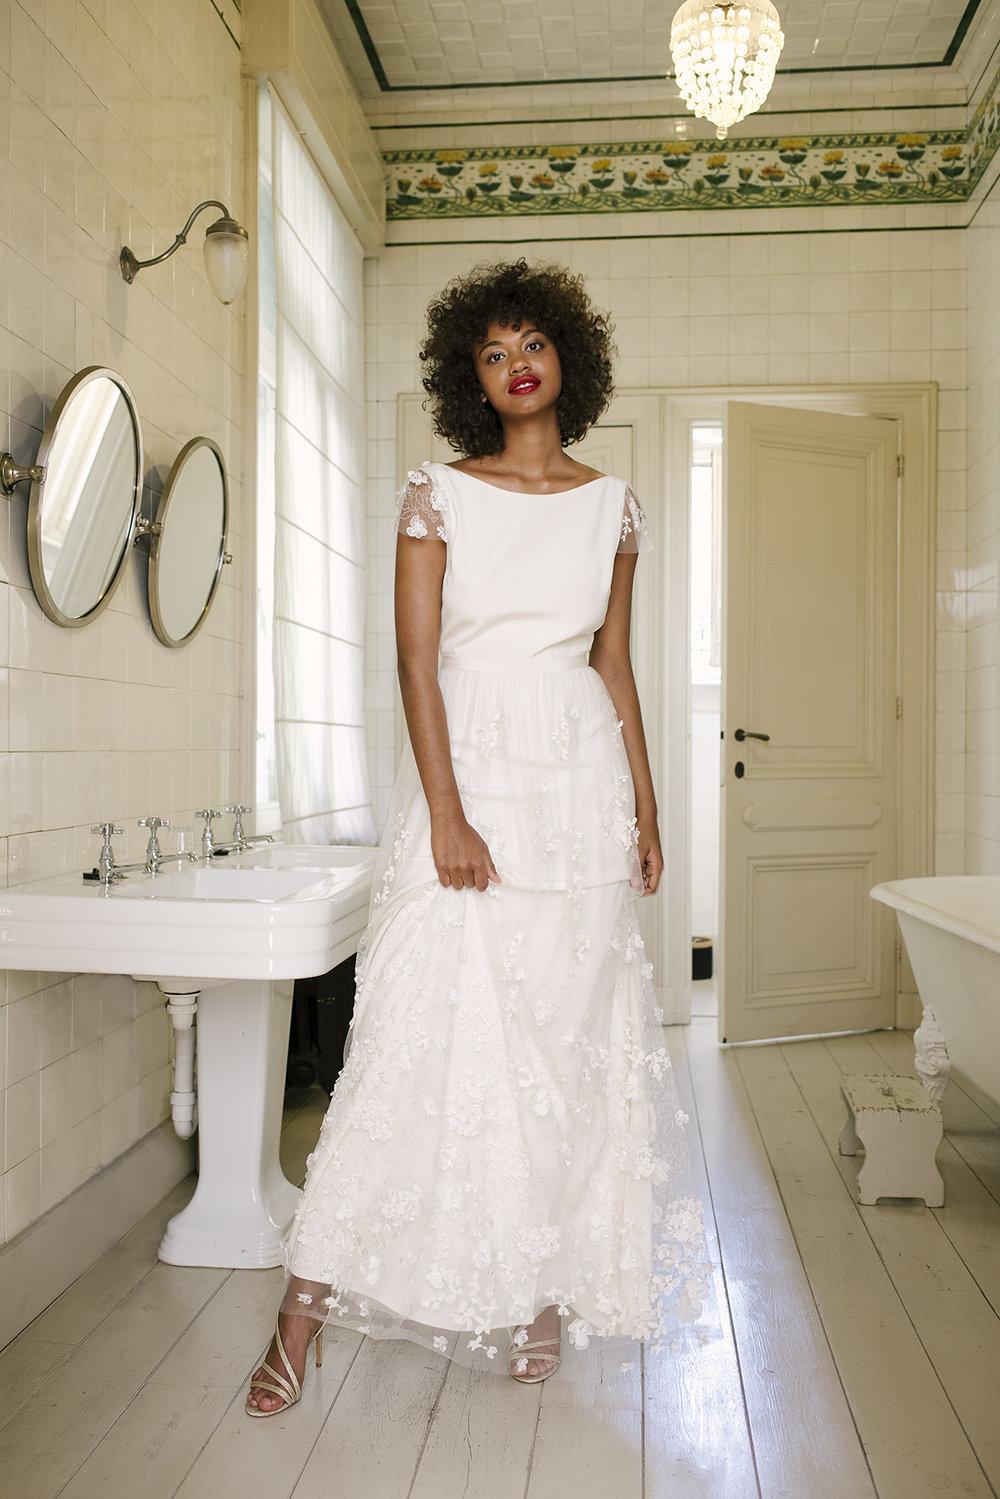 valentine-avoh-robe-mariee-jackie-wedding-dress-bruxelles-photo-elodie-timmermans-24.jpg